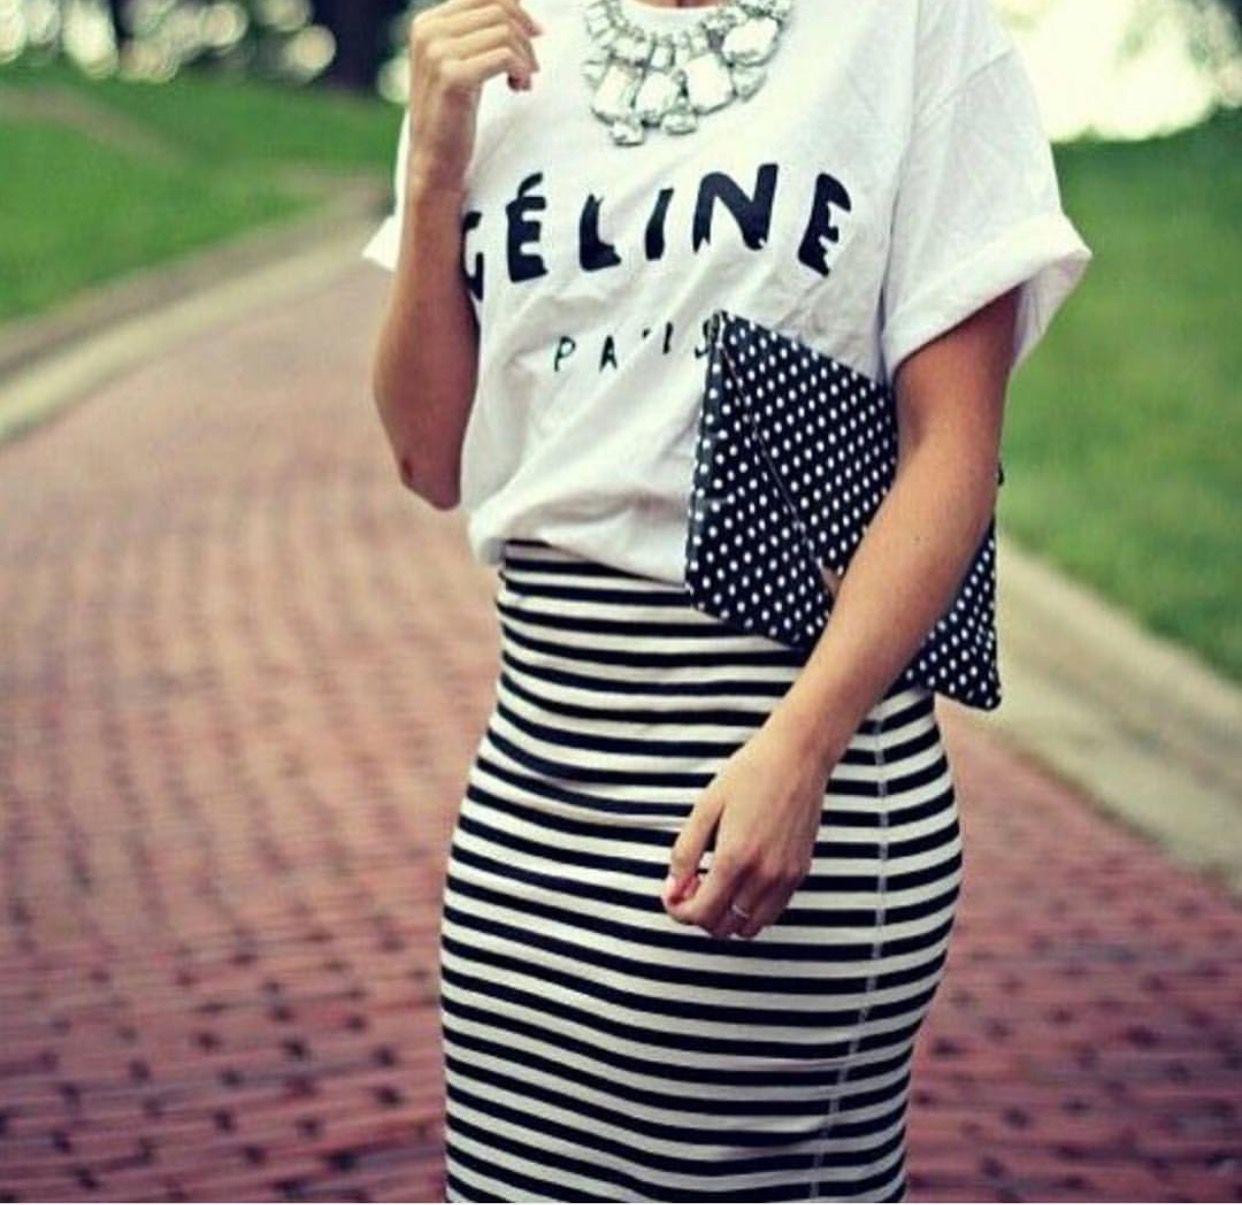 #celine #blackandwhite